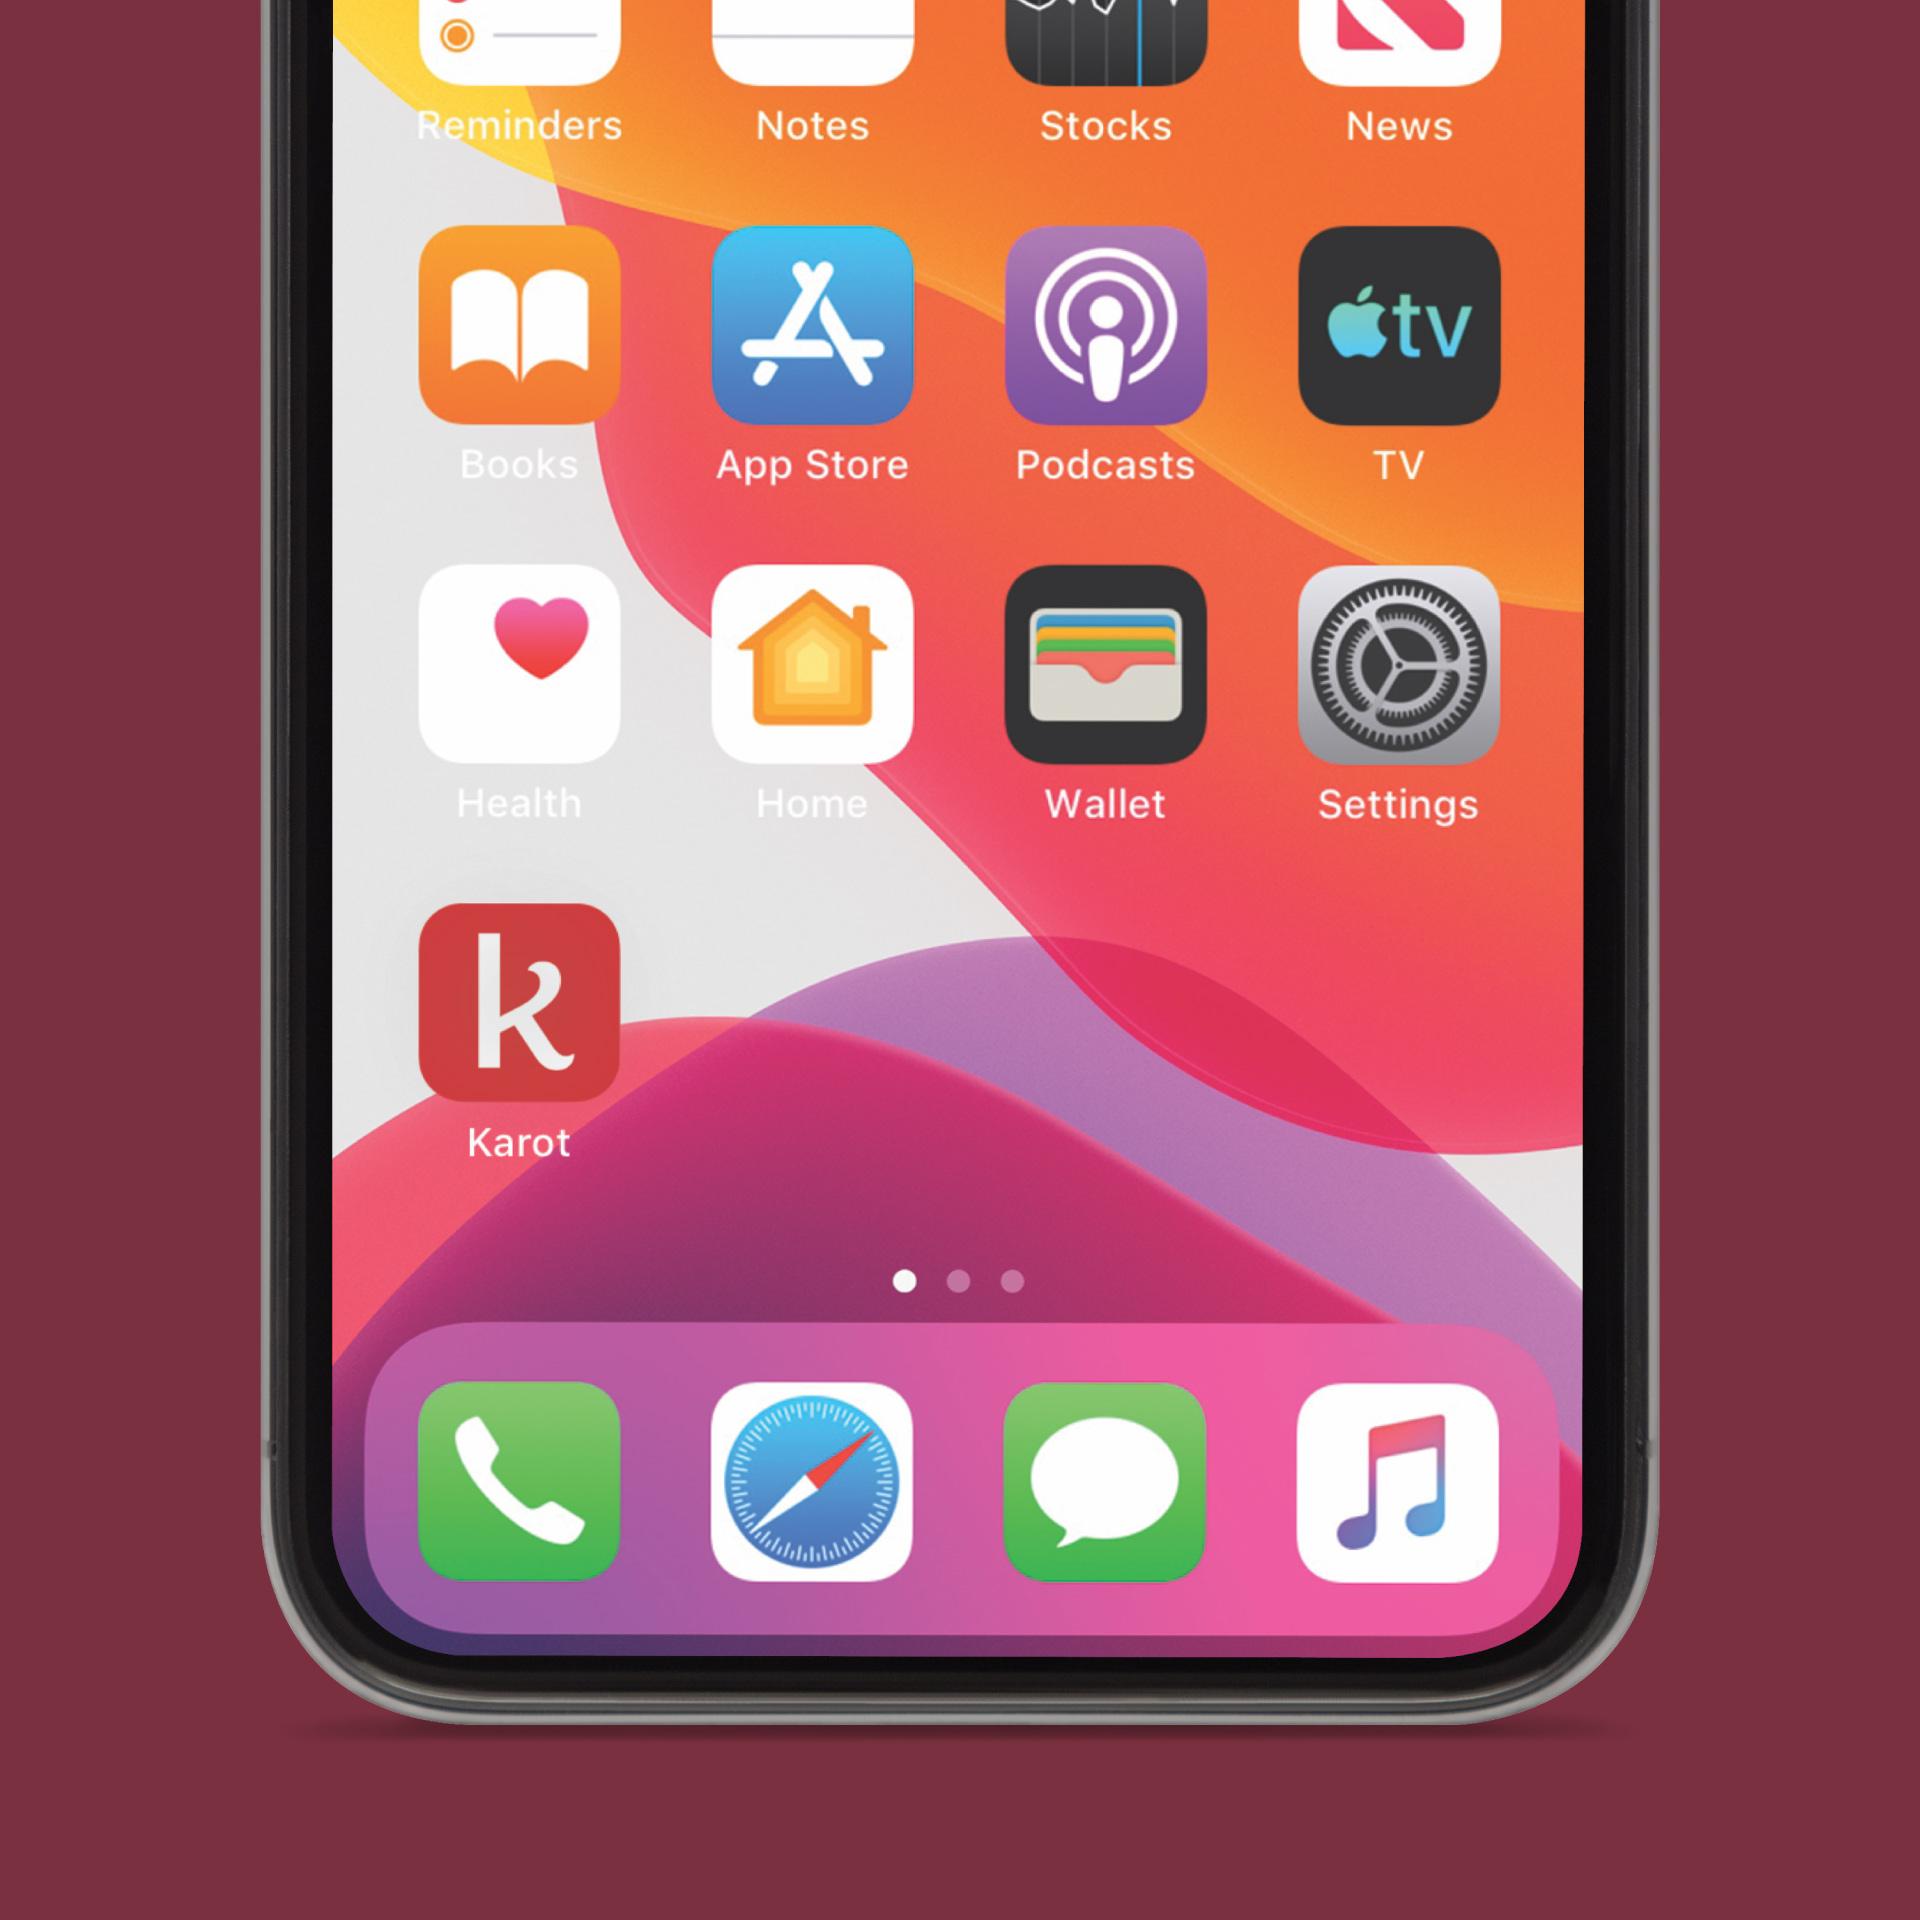 Karot-Brand-Identity-Design-34